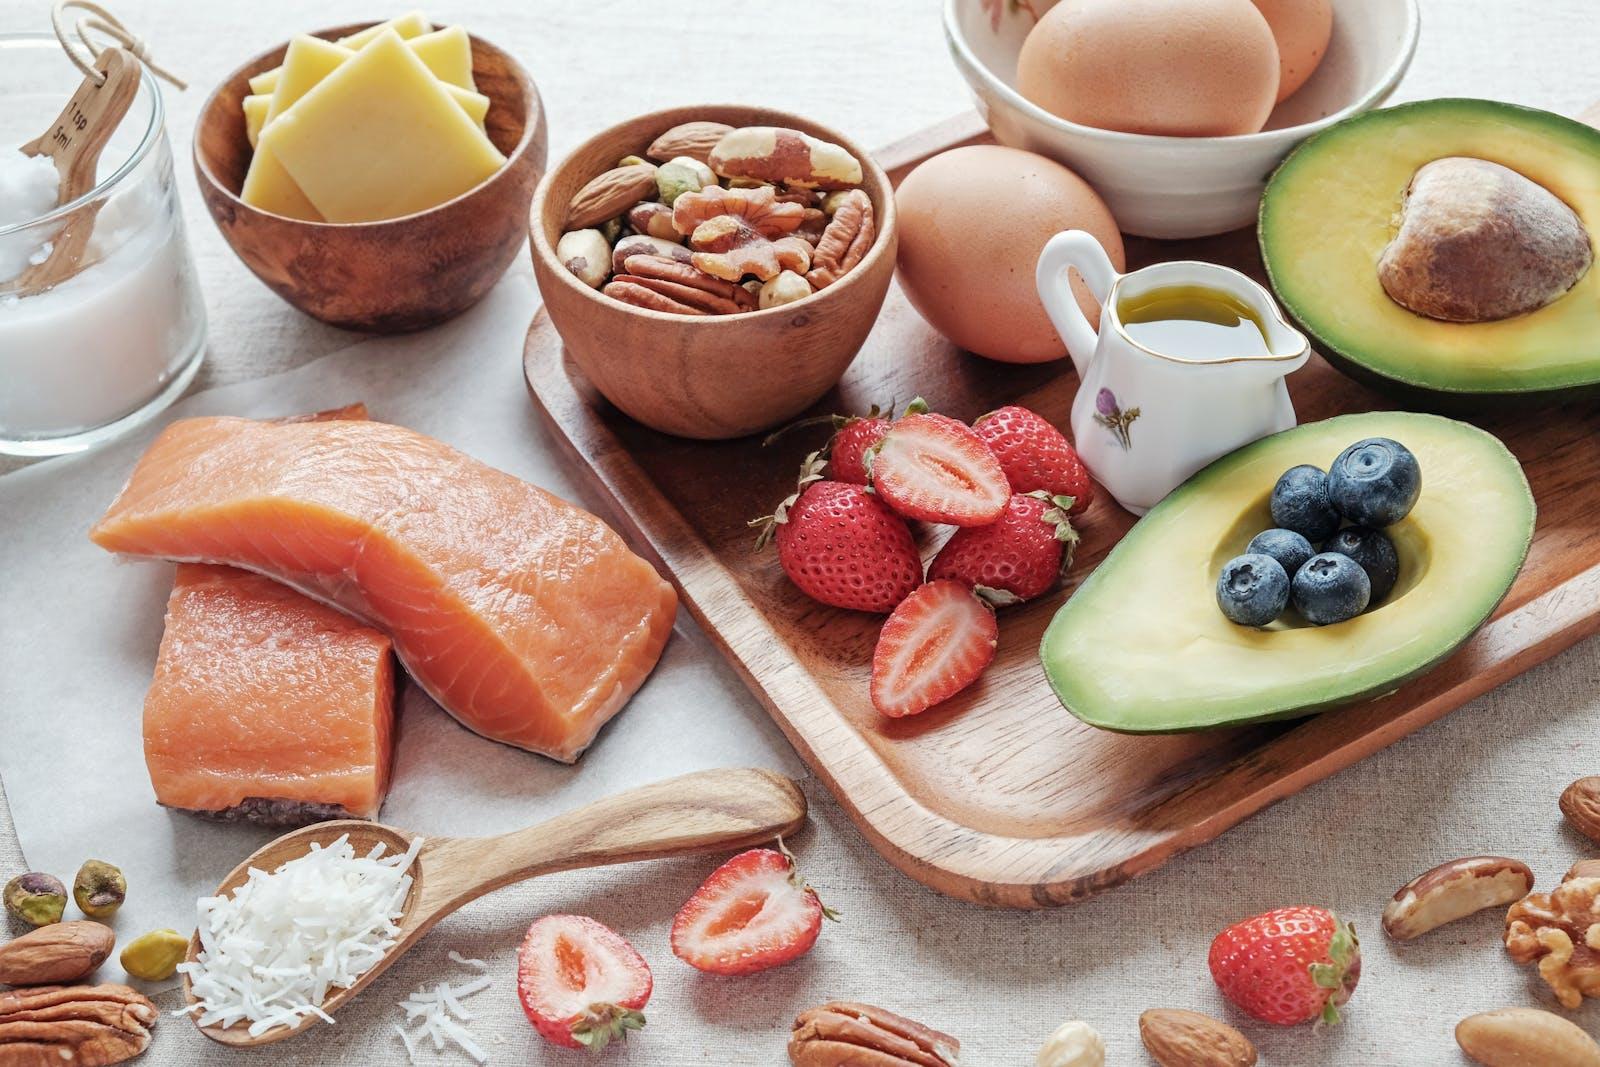 www.dietdoctor.com